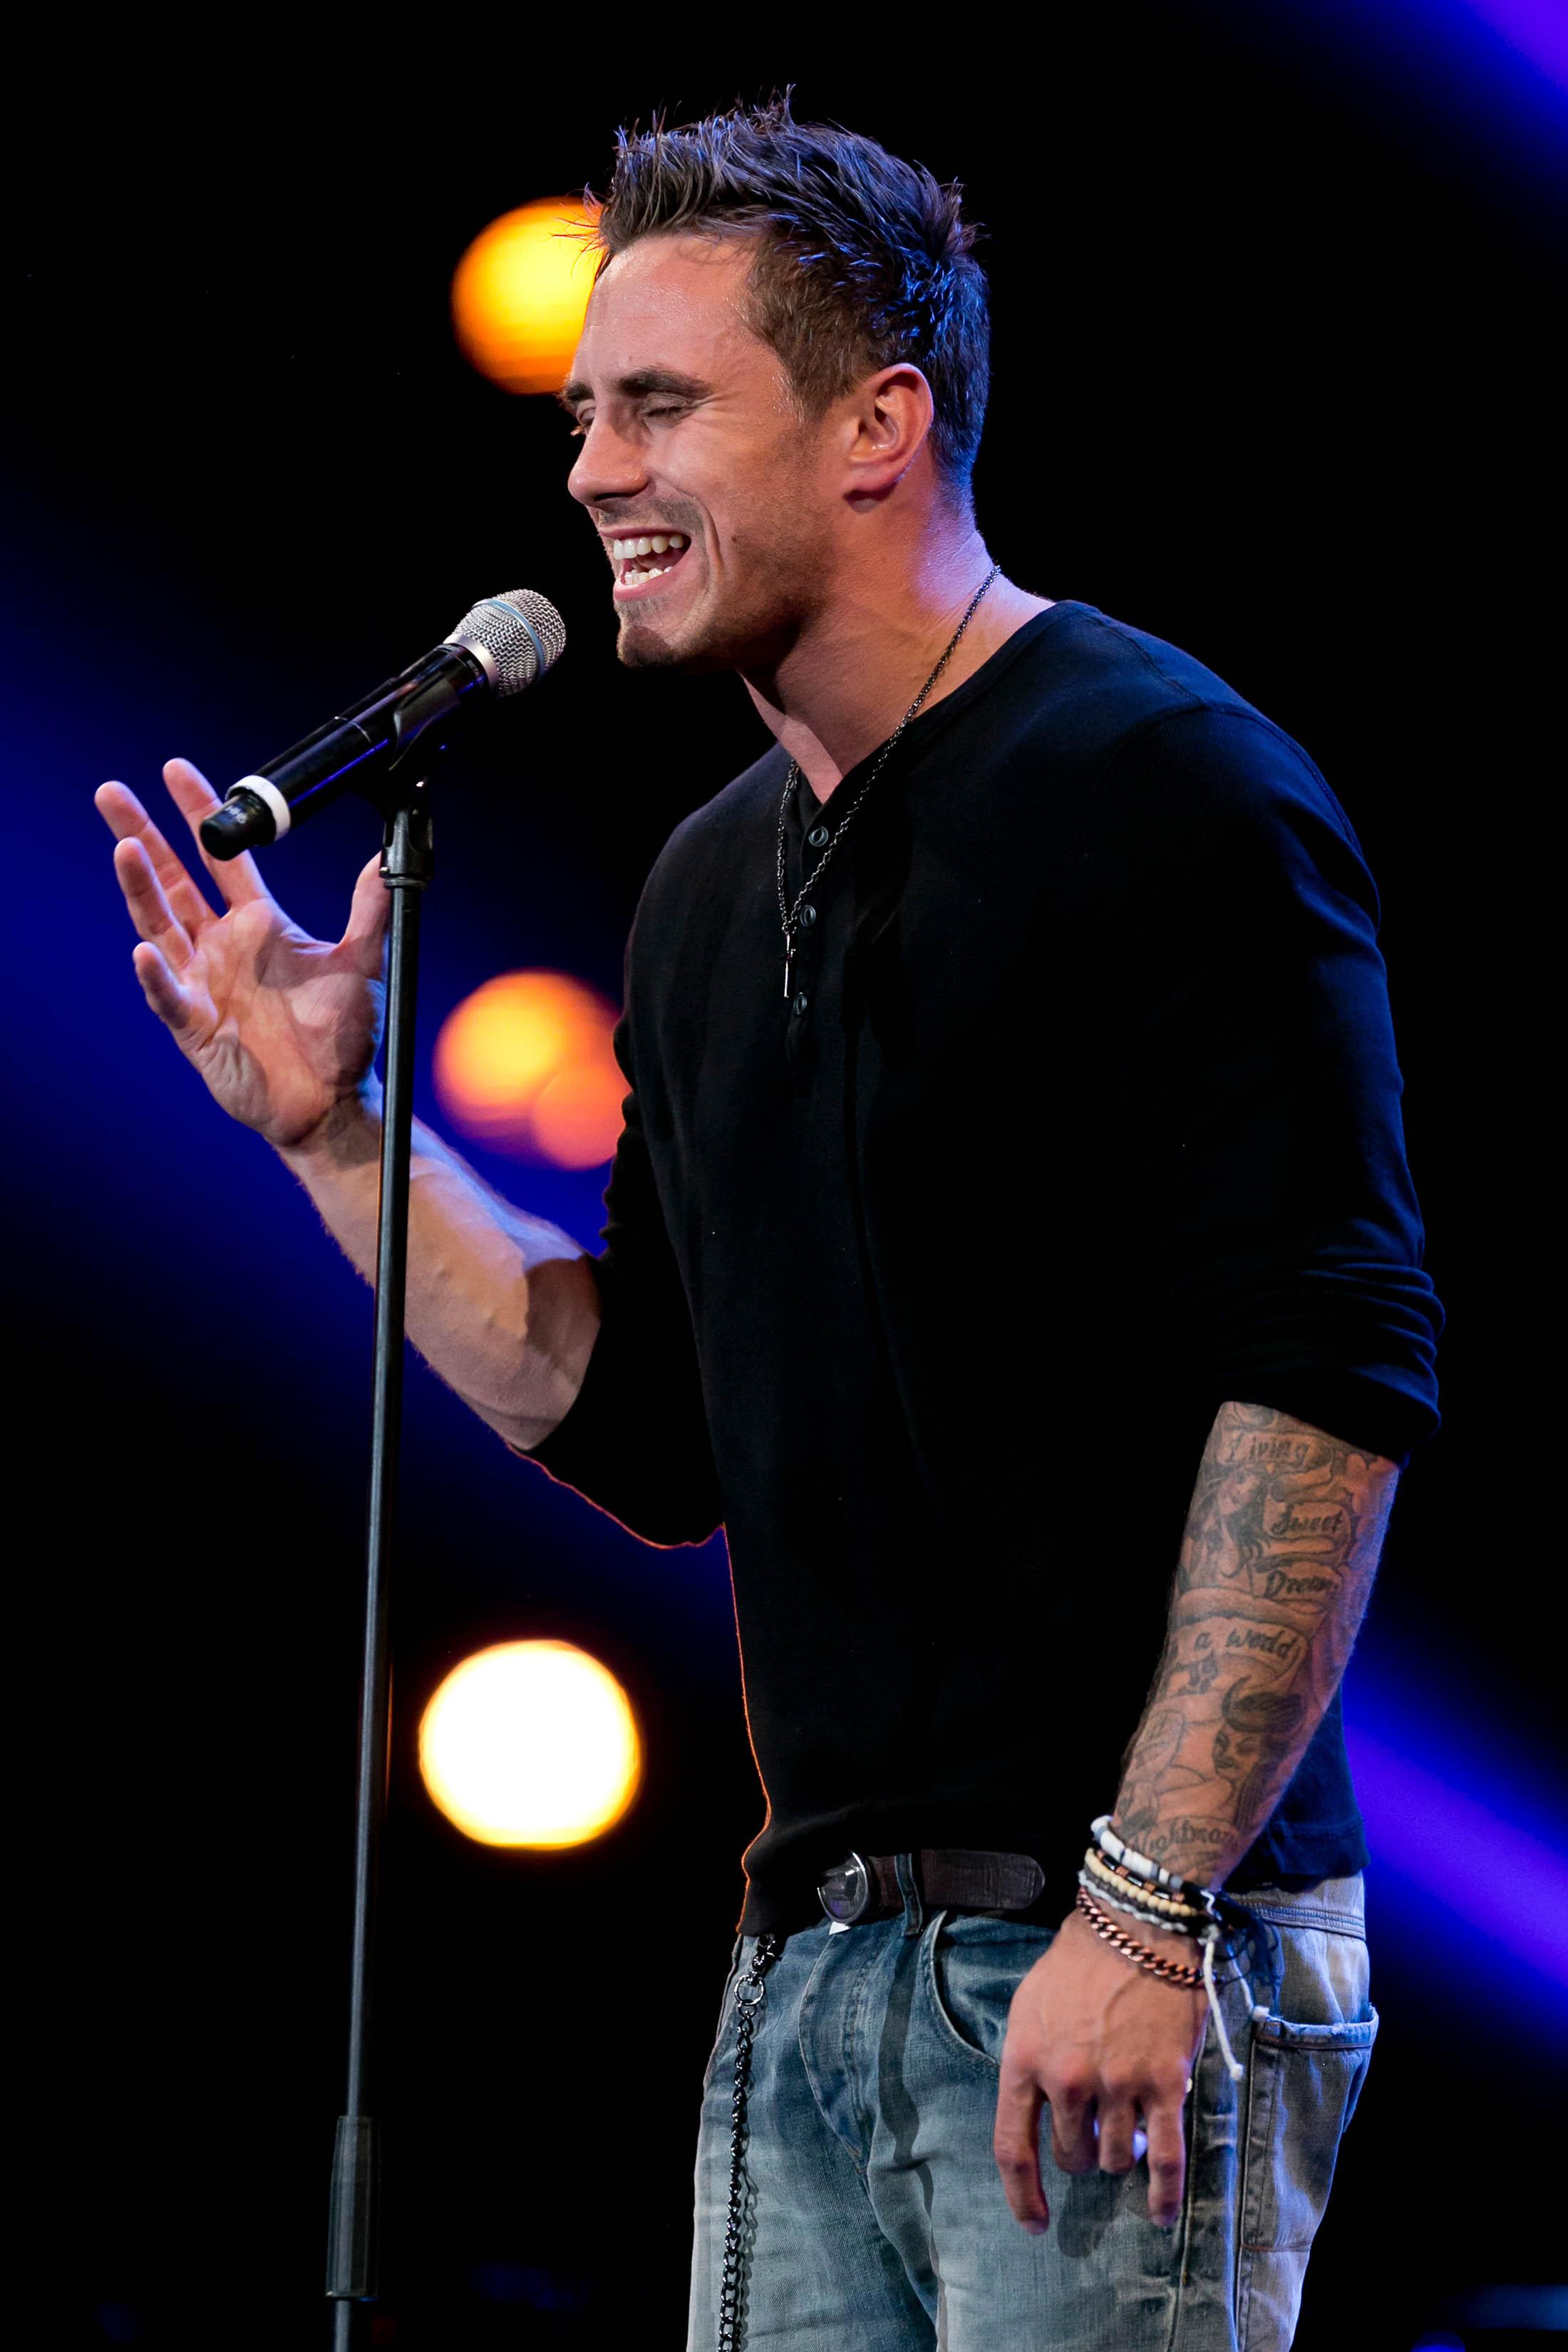 X Factor Joseph Whelan